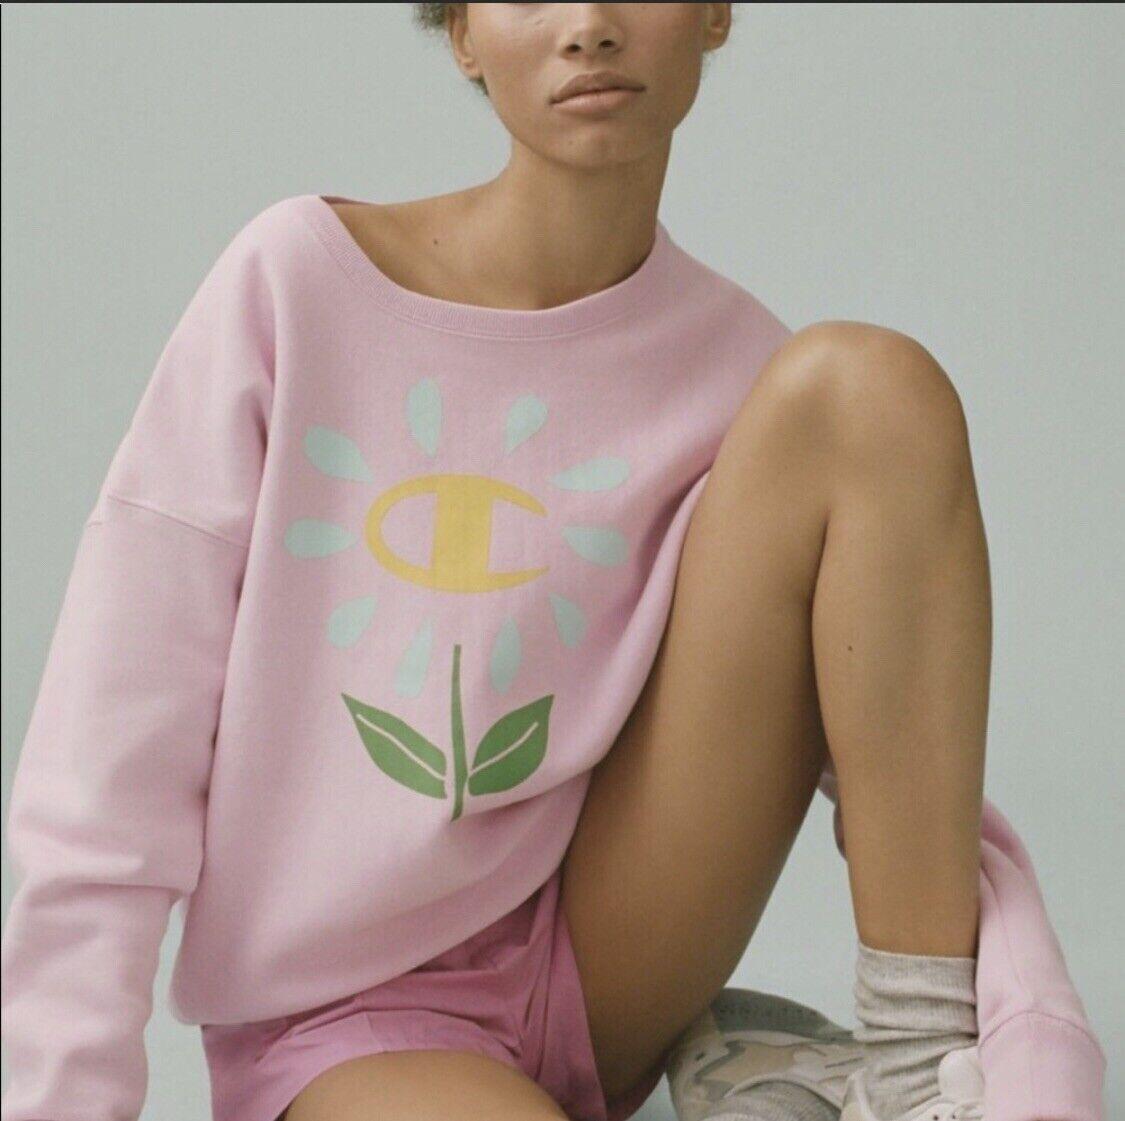 NWT Limited Edition Urban outfitters X susan alexandra flower Sweatshirt